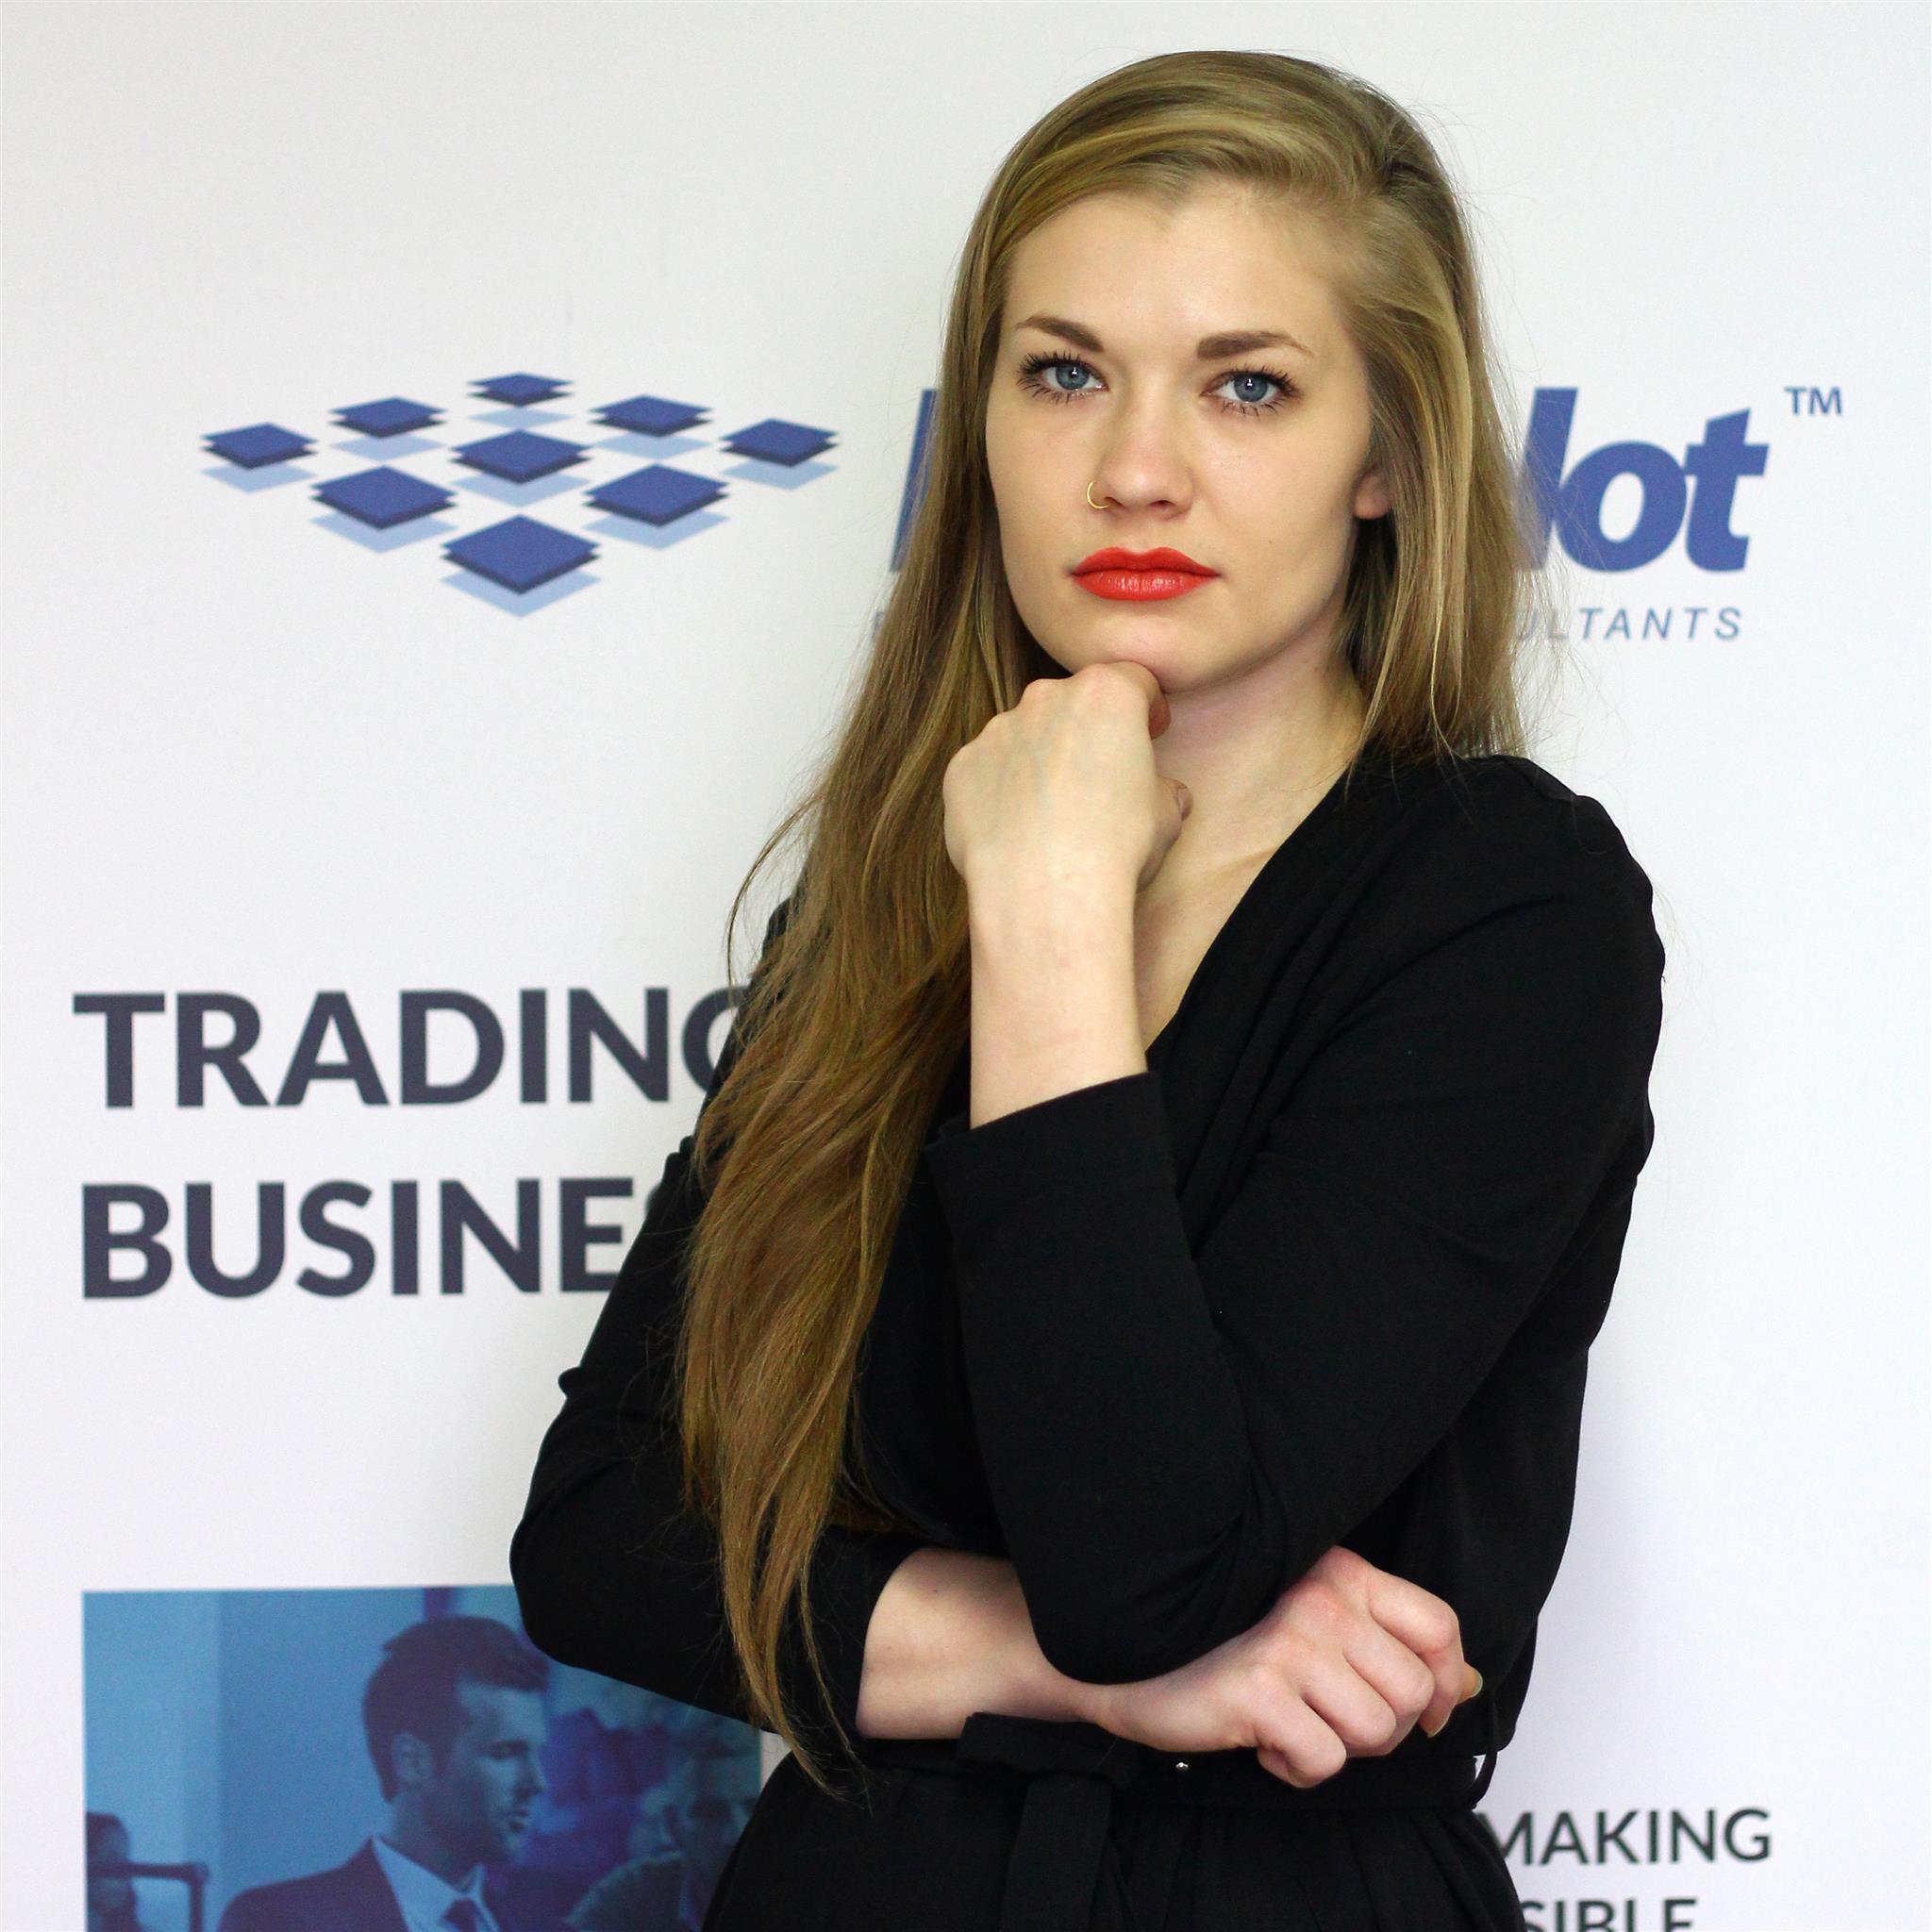 Customer Service Lina Franikowska